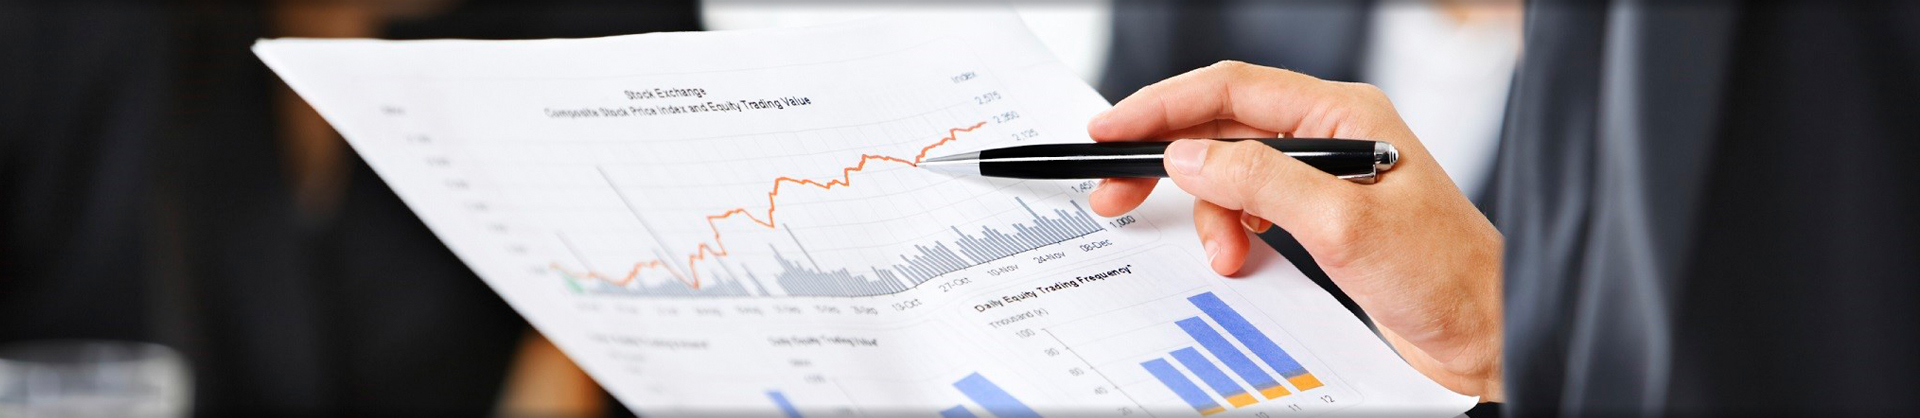 Finance & Business